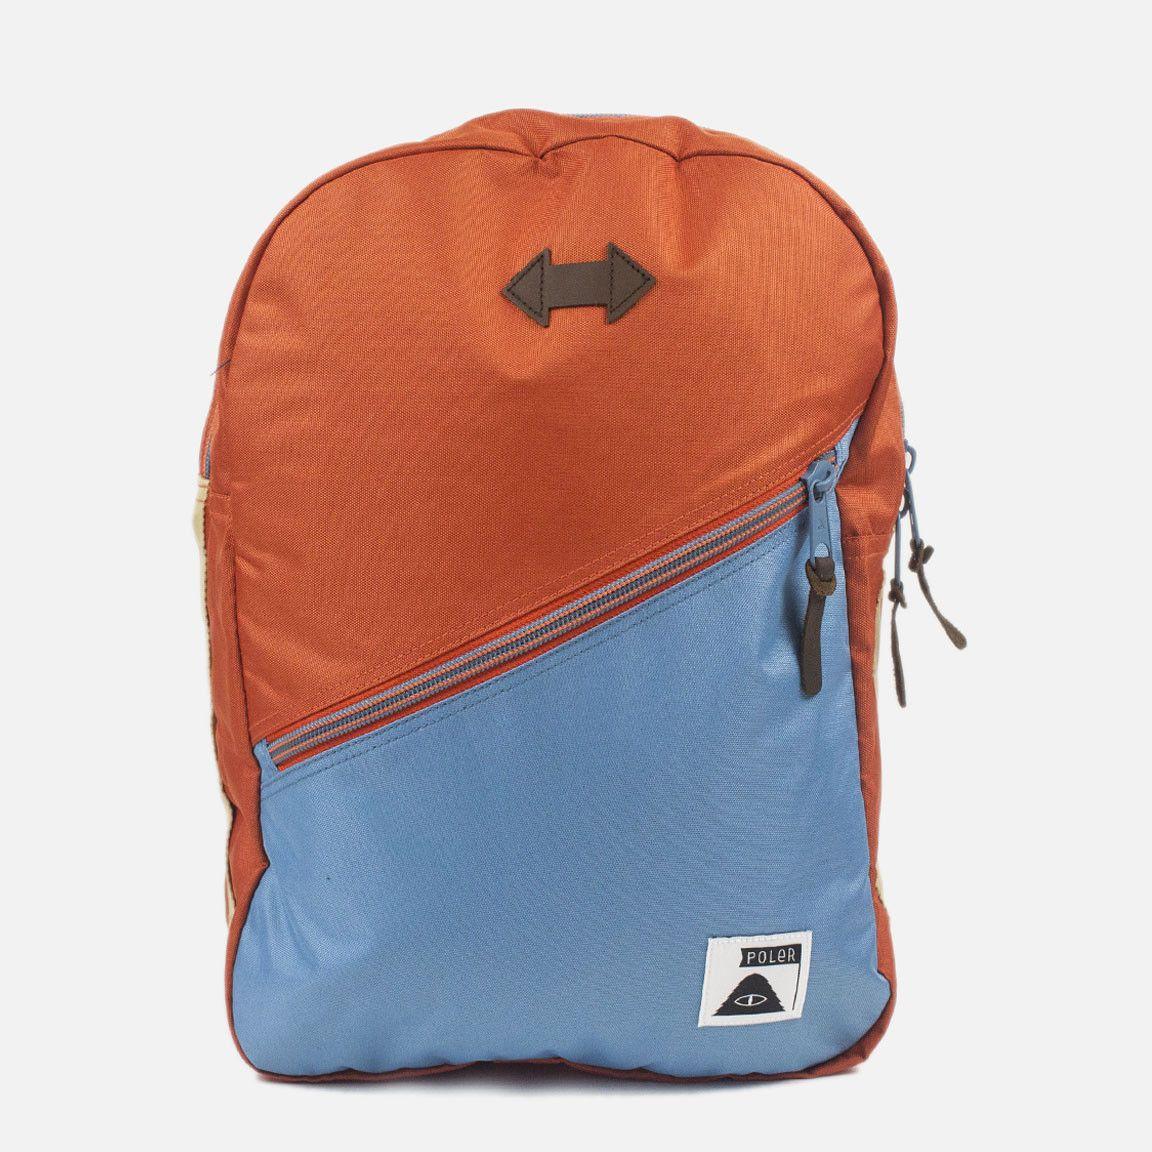 Poler Stuff Drifter Backpack - Burnt Orange True Blue  b5d8e62e06fbf